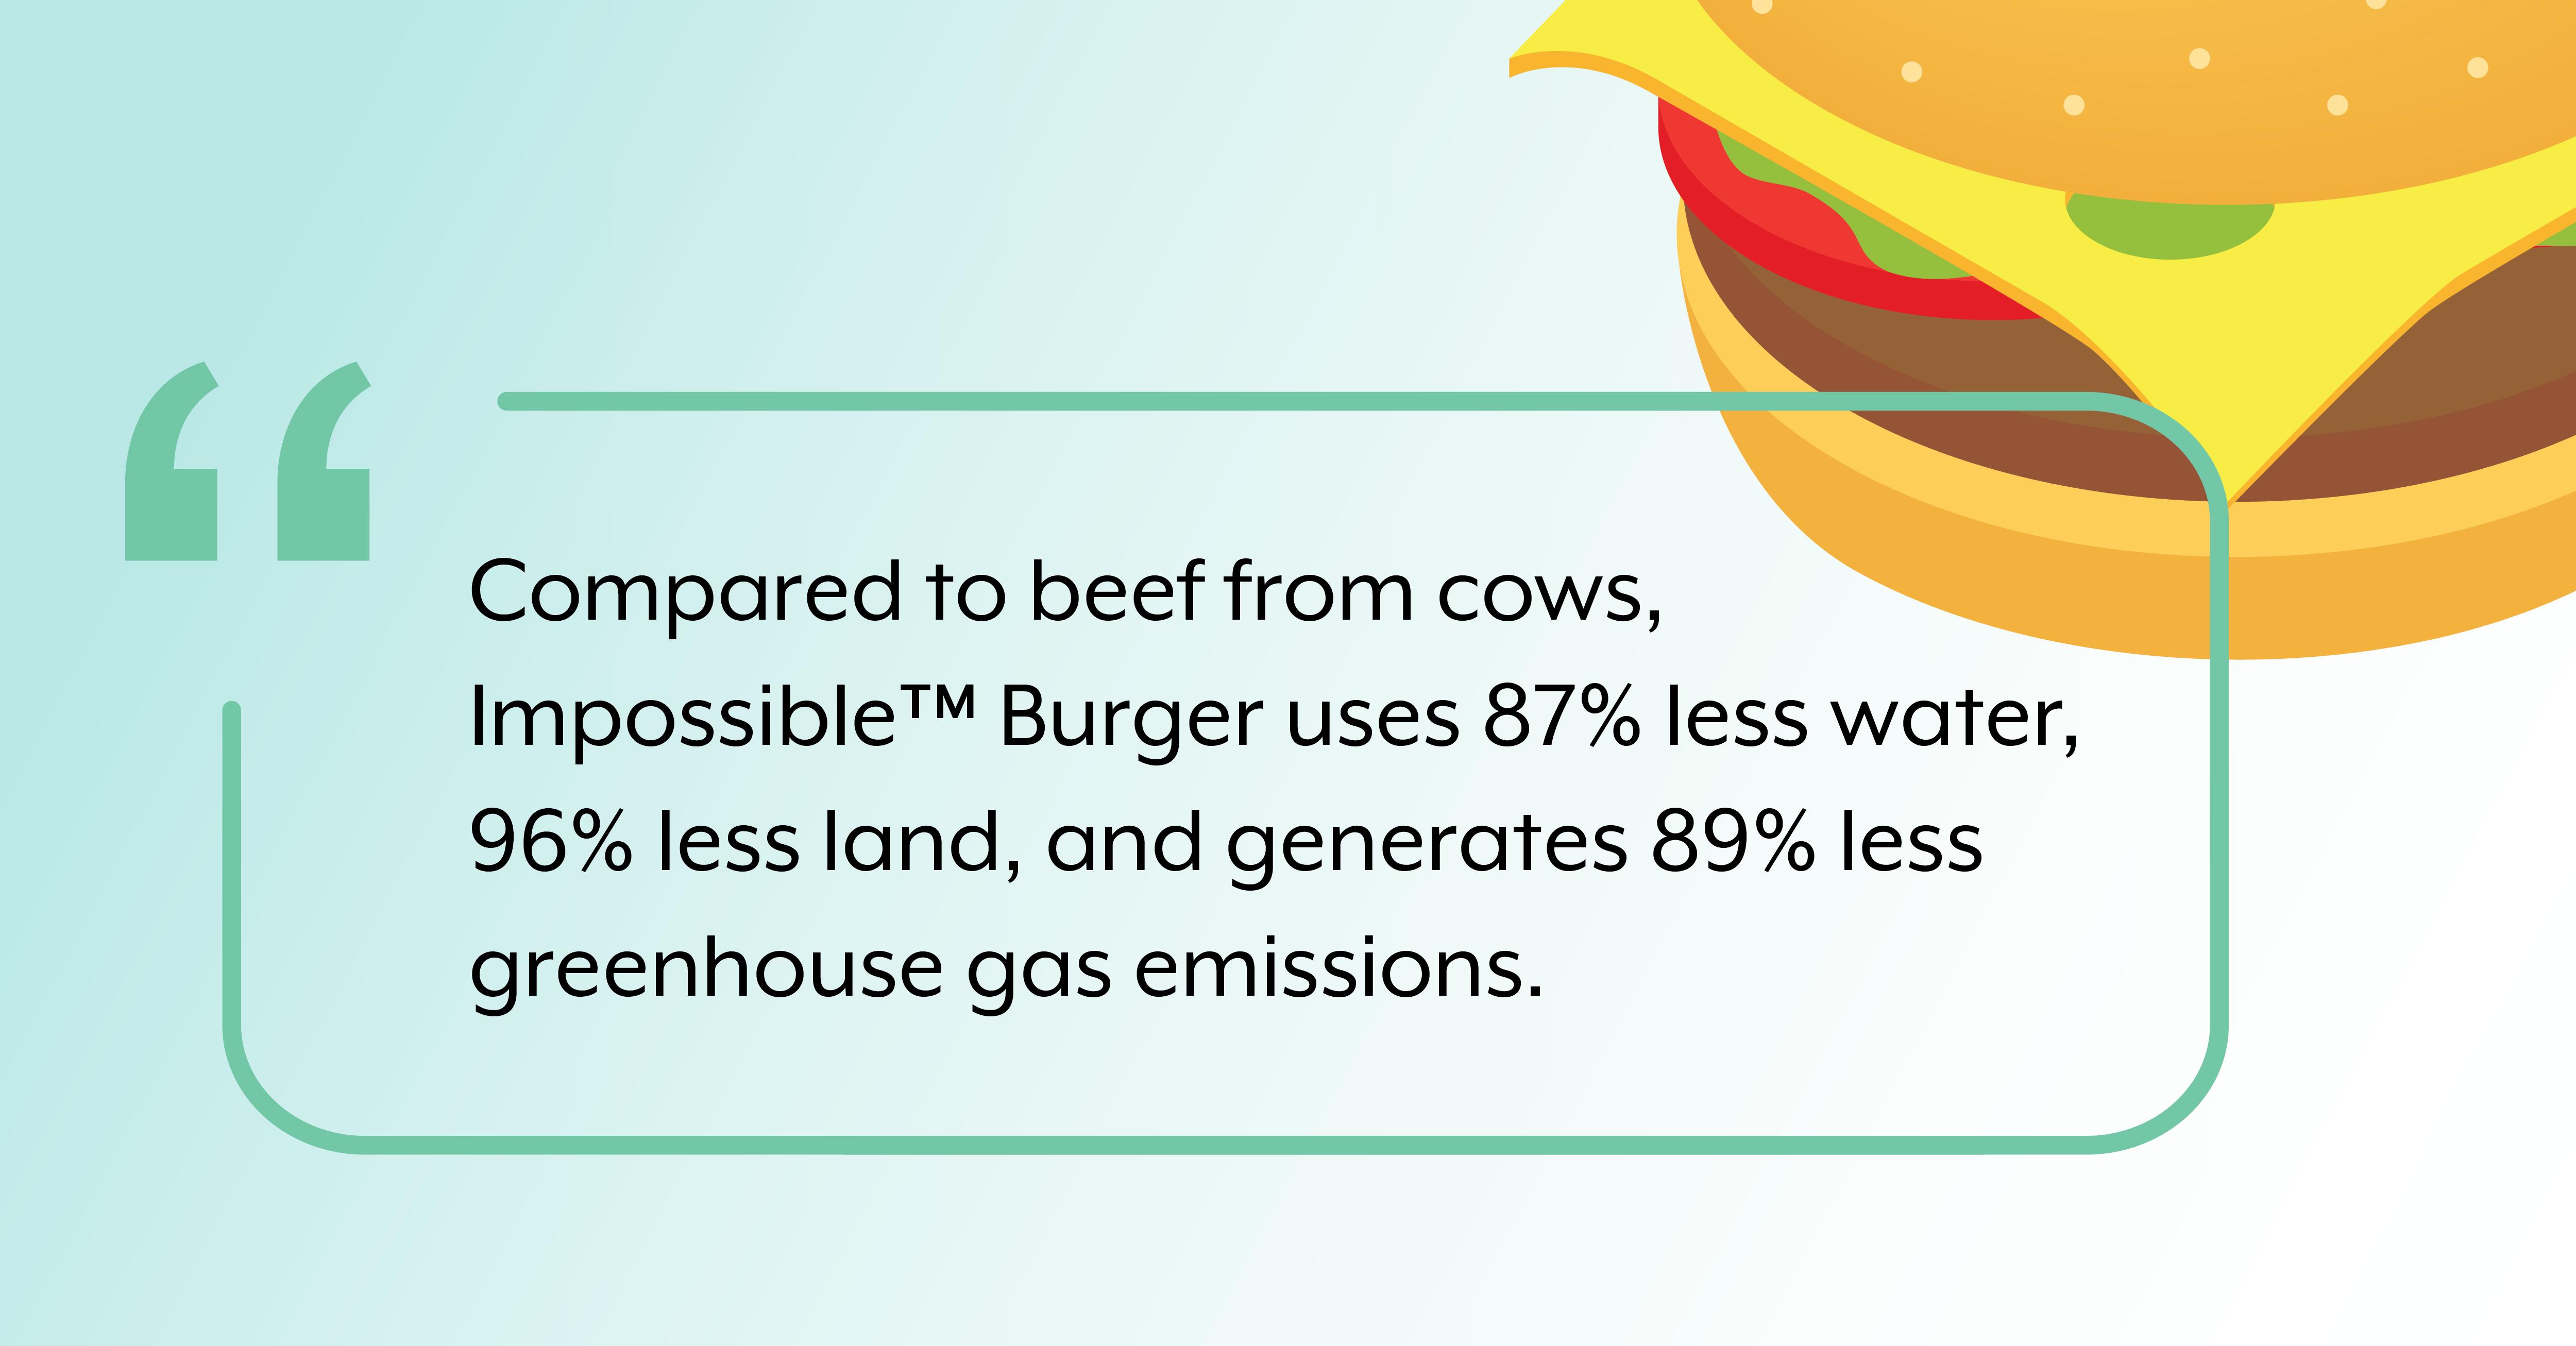 plant-based-meat-statistics